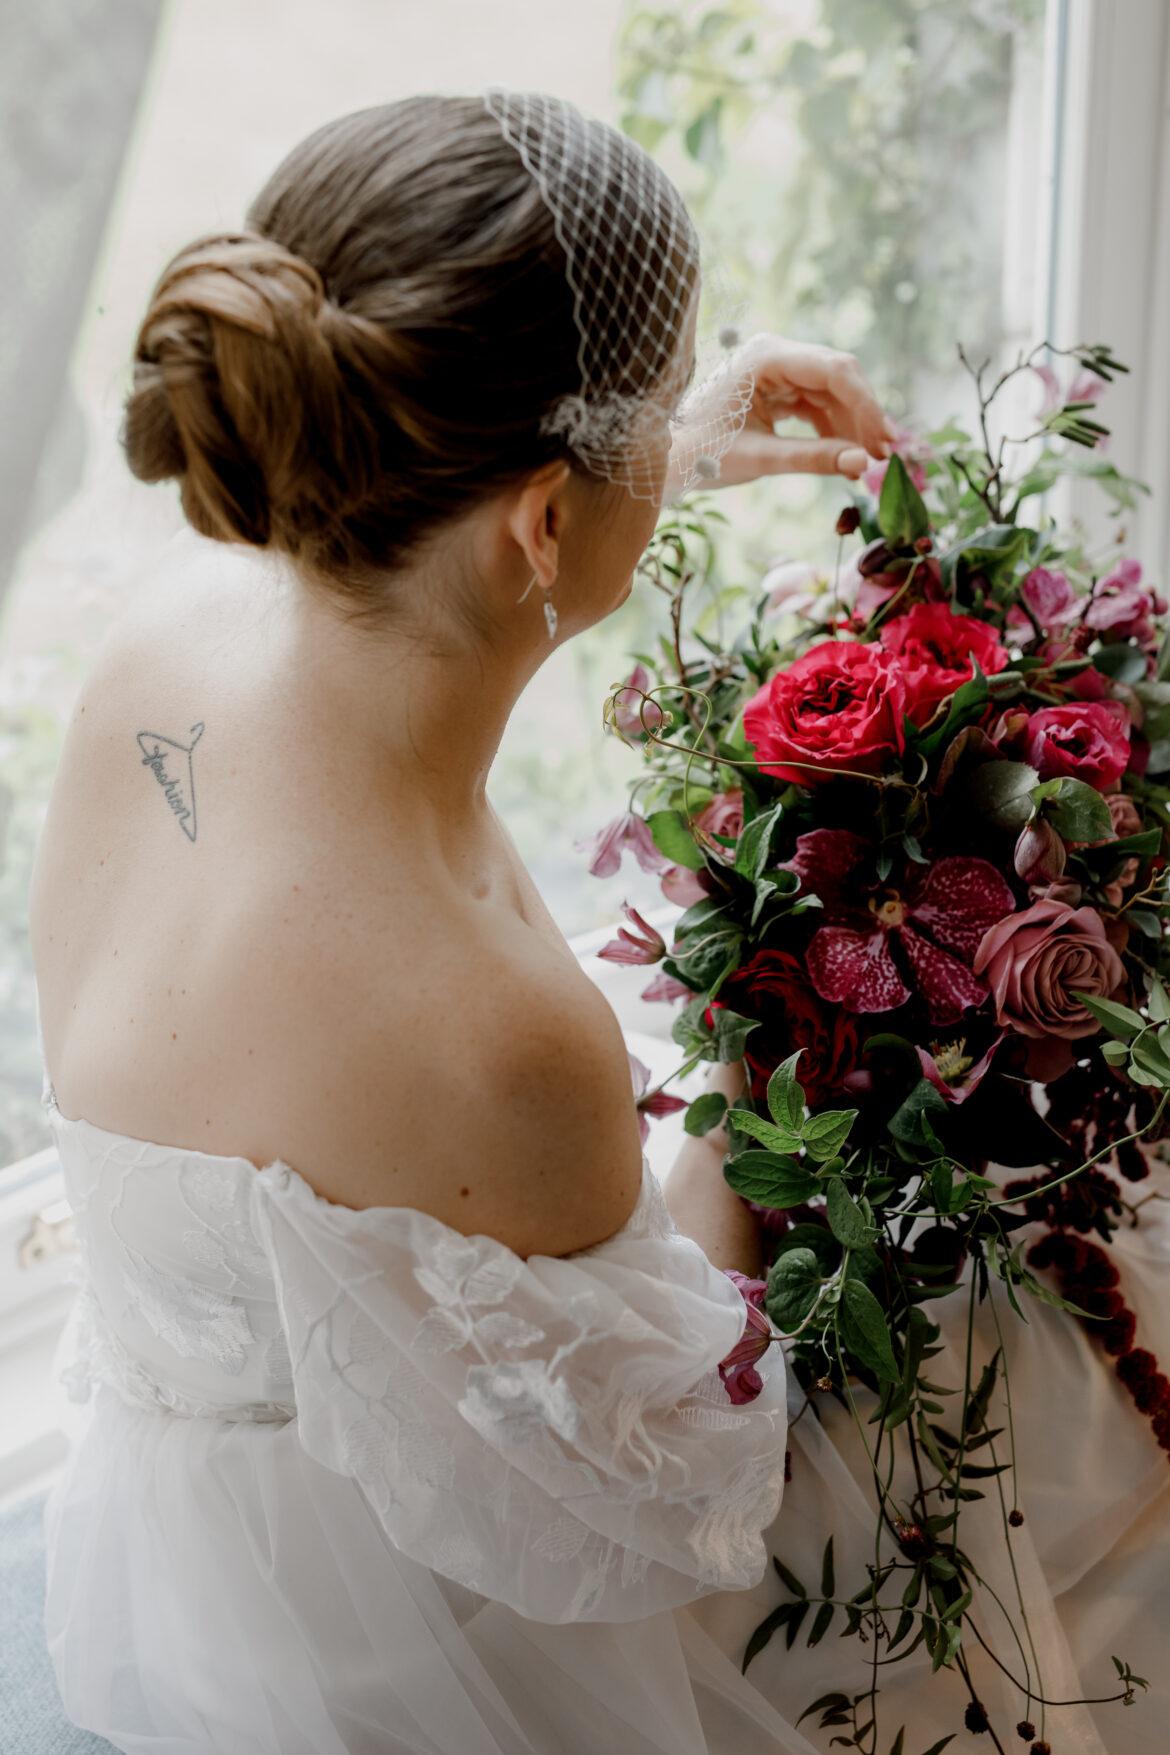 Wedding hair trial prep